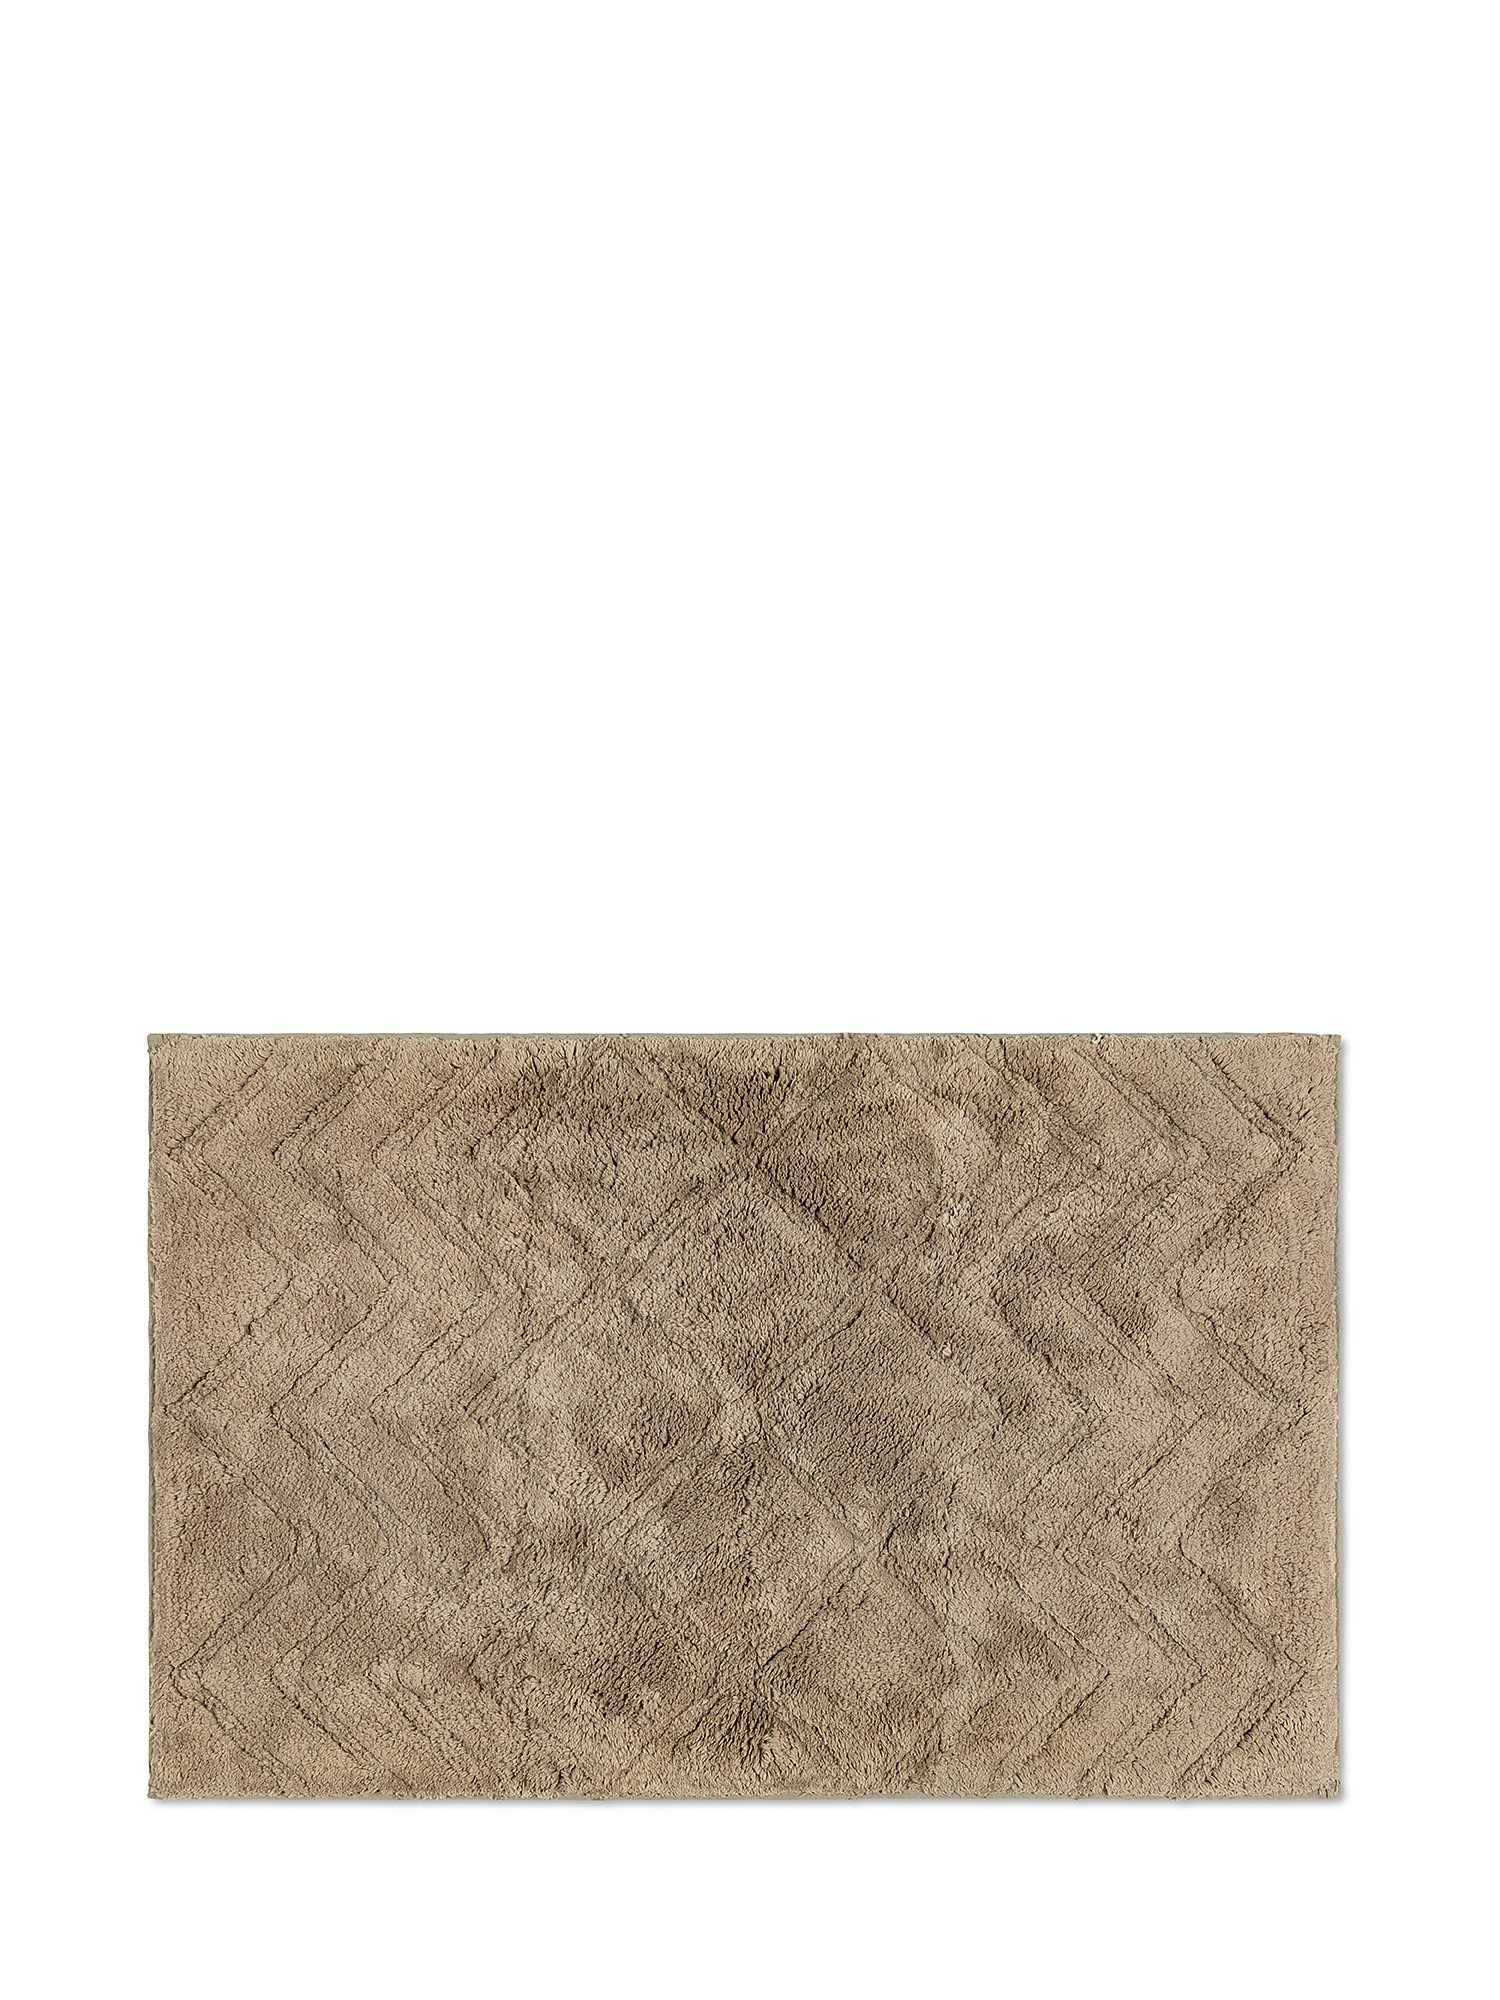 Tappeto bagno spugna di cotone motivo a rombi, Beige, large image number 0